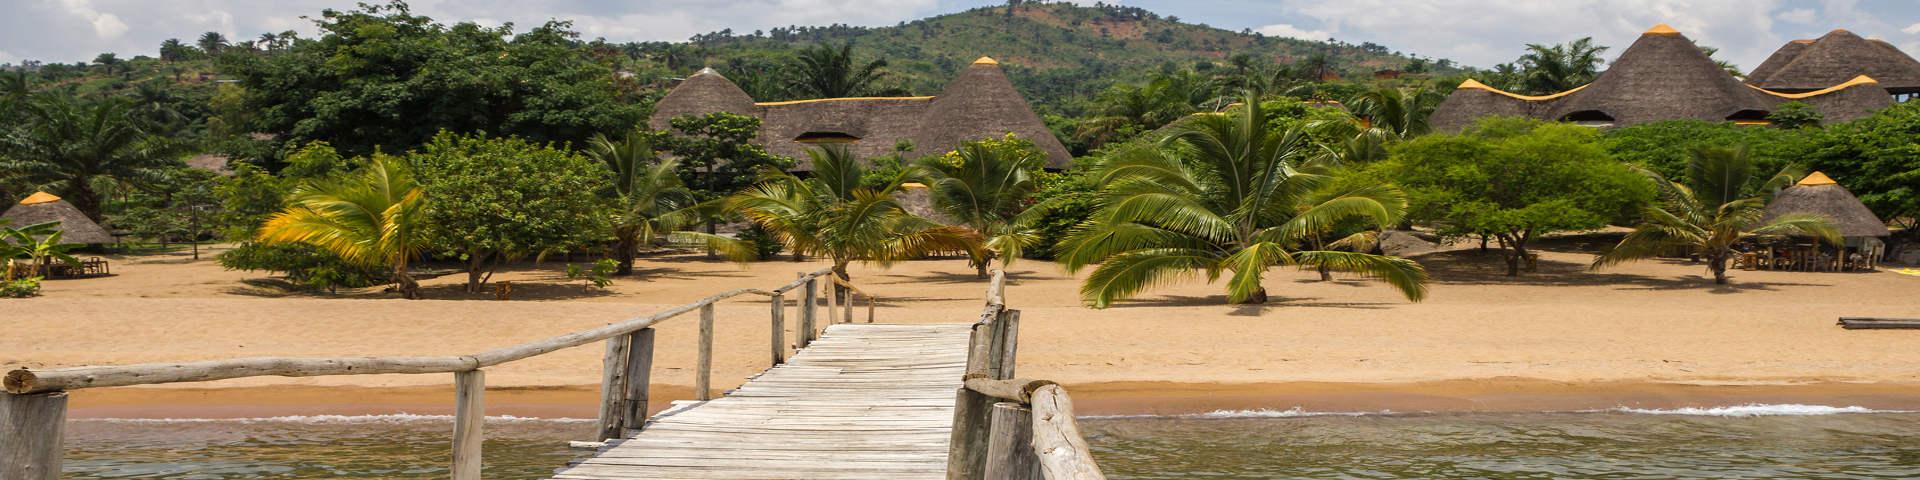 Bujumbura hero image 4